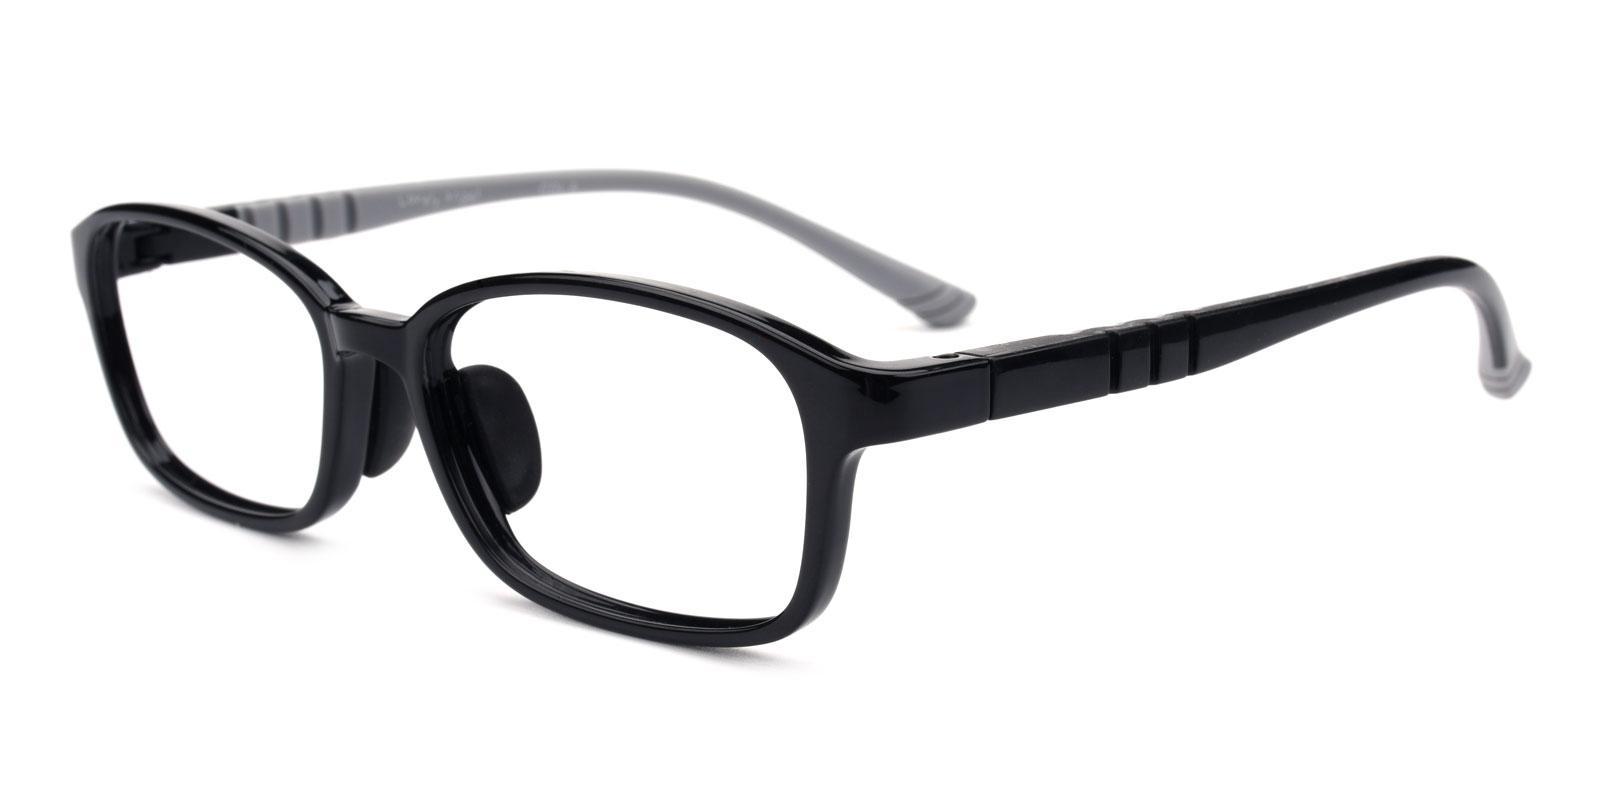 Sharon-Black-Rectangle-TR-Eyeglasses-additional1